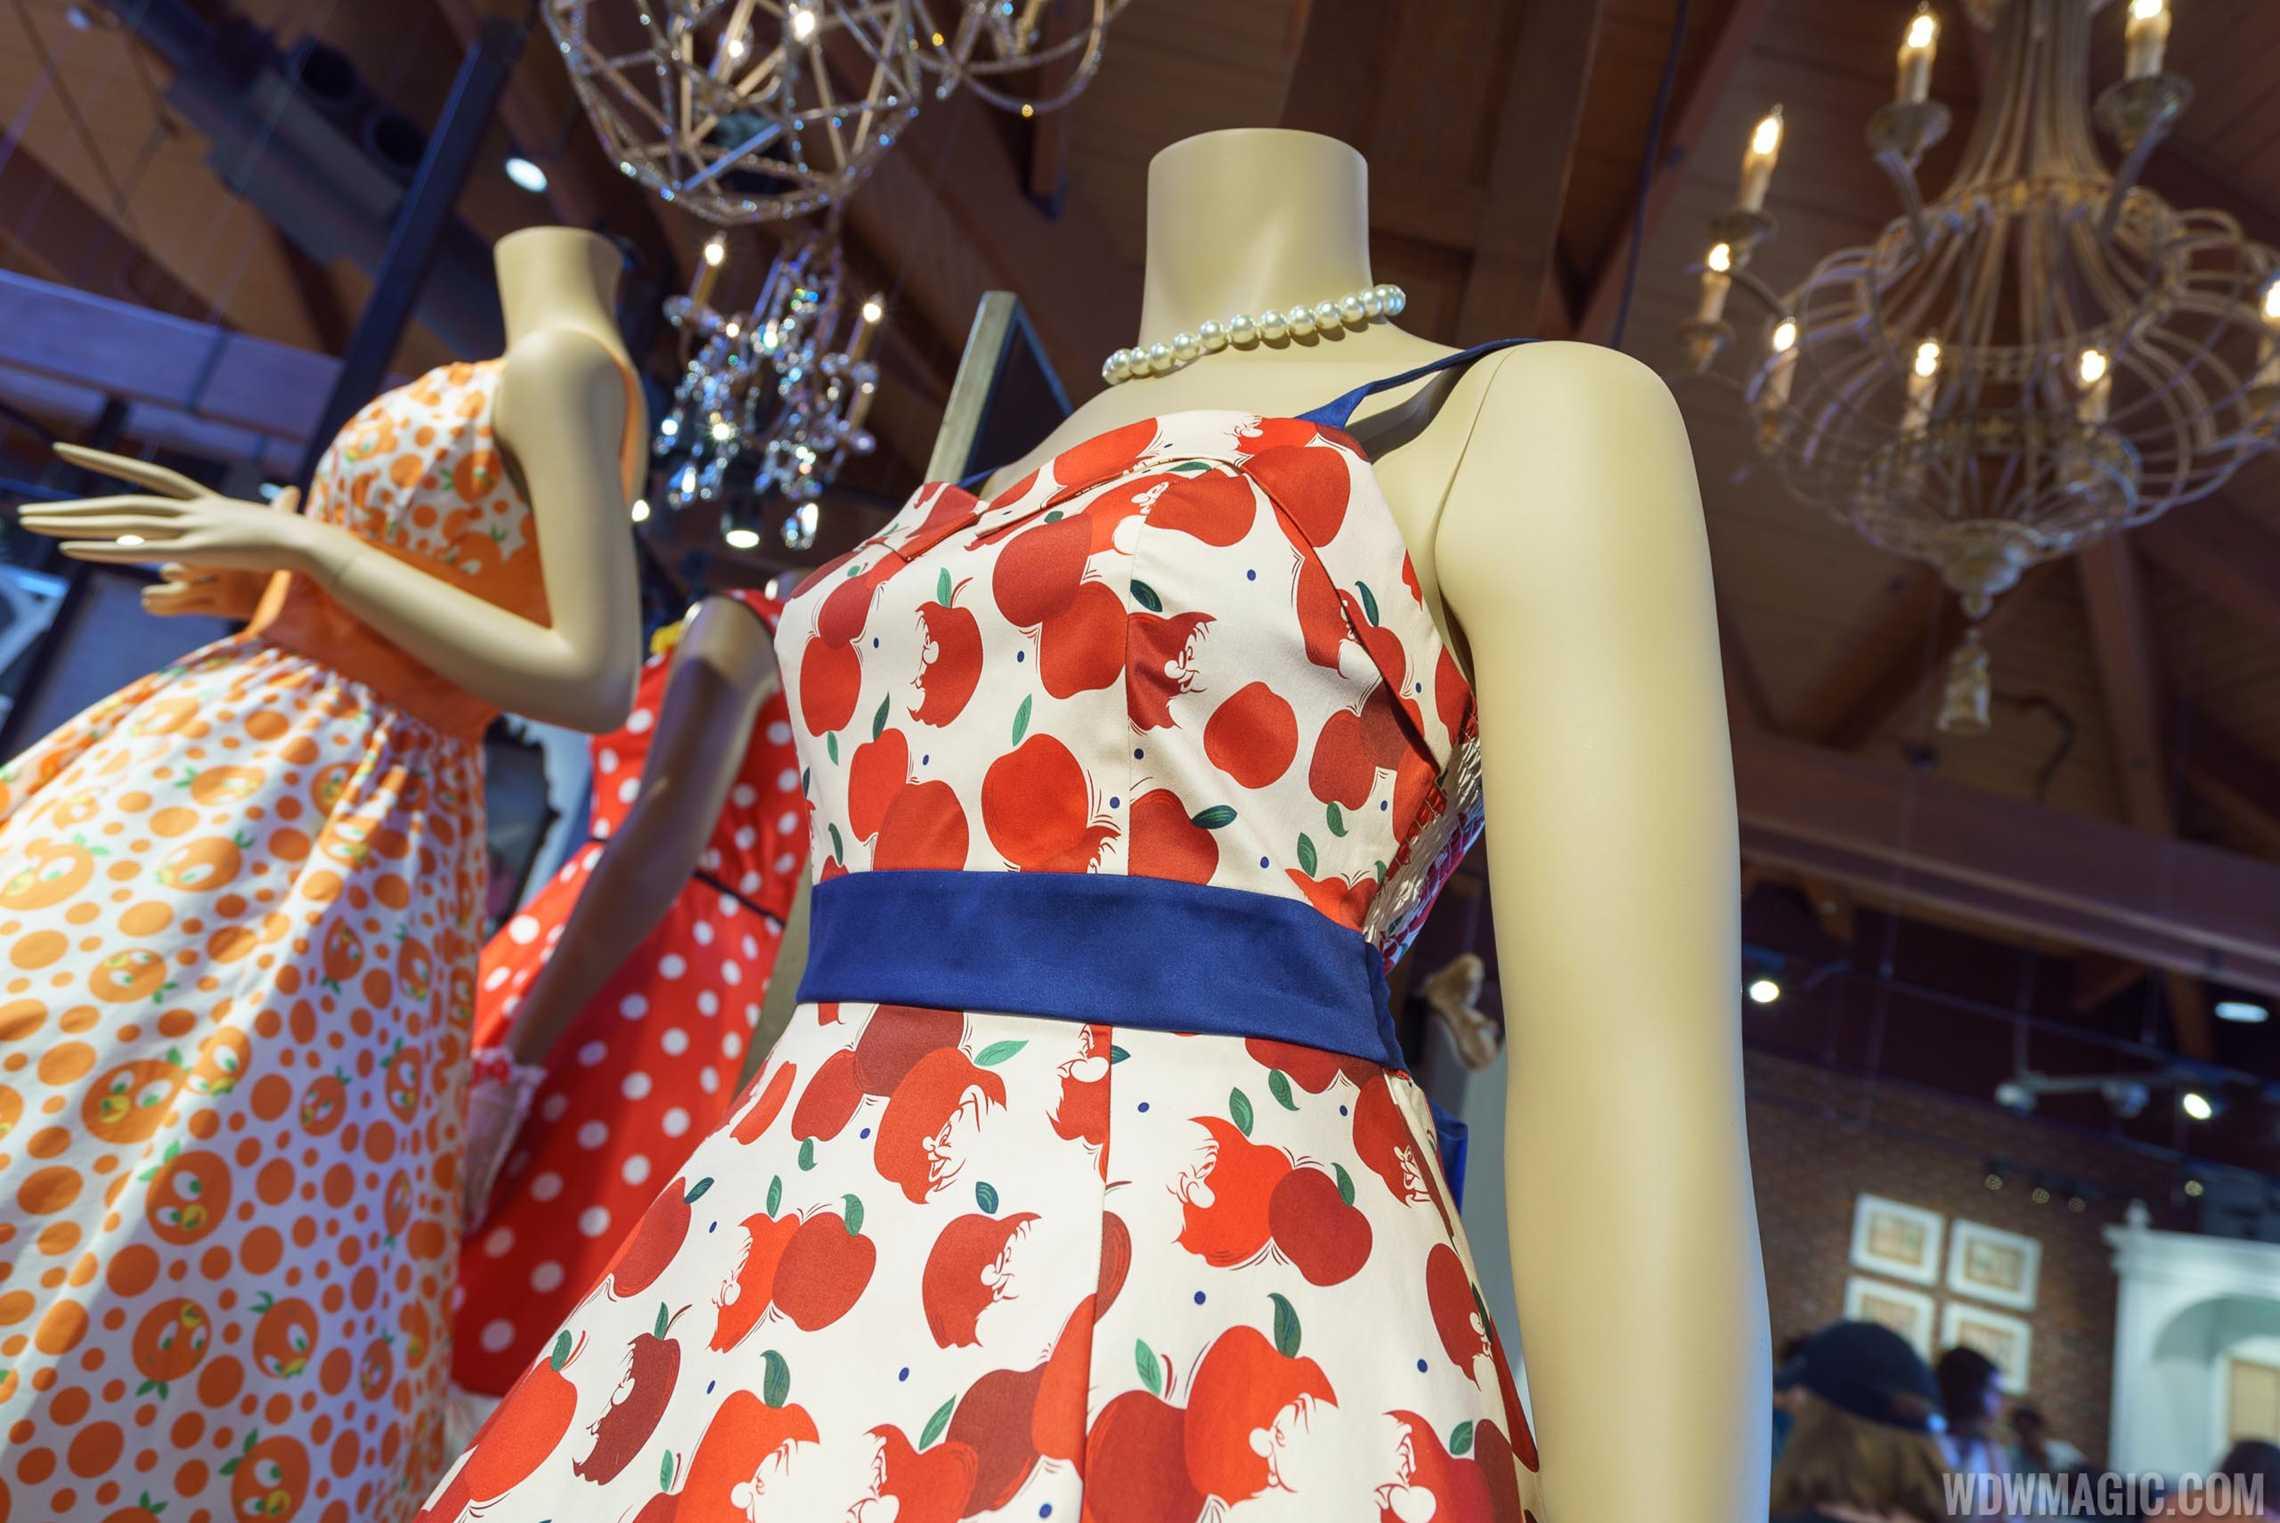 The Dress Shop on Cherry Tree Lane - Snow White dress